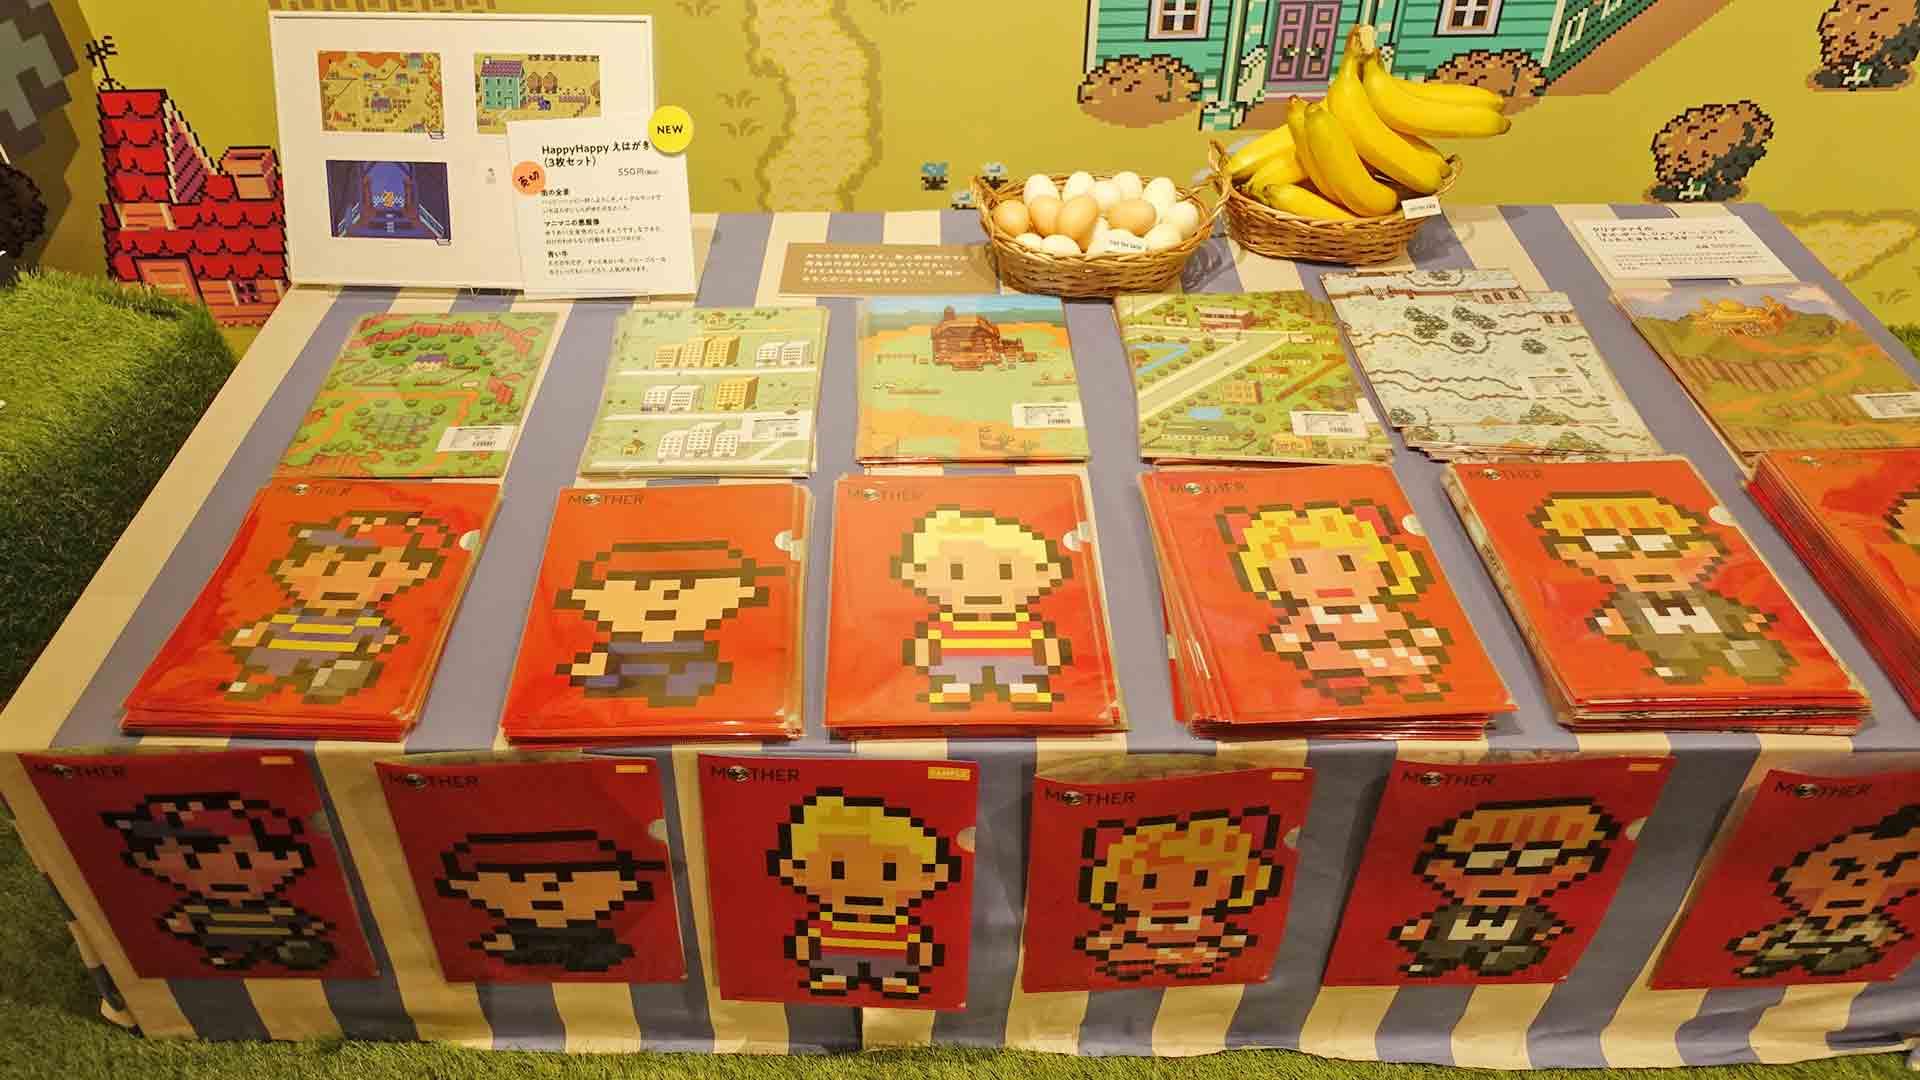 MOTHER2,MOTHERのひろば,ほぼ日,渋谷パルコ,イベント,レトロゲーム,ネス,クリアファイル